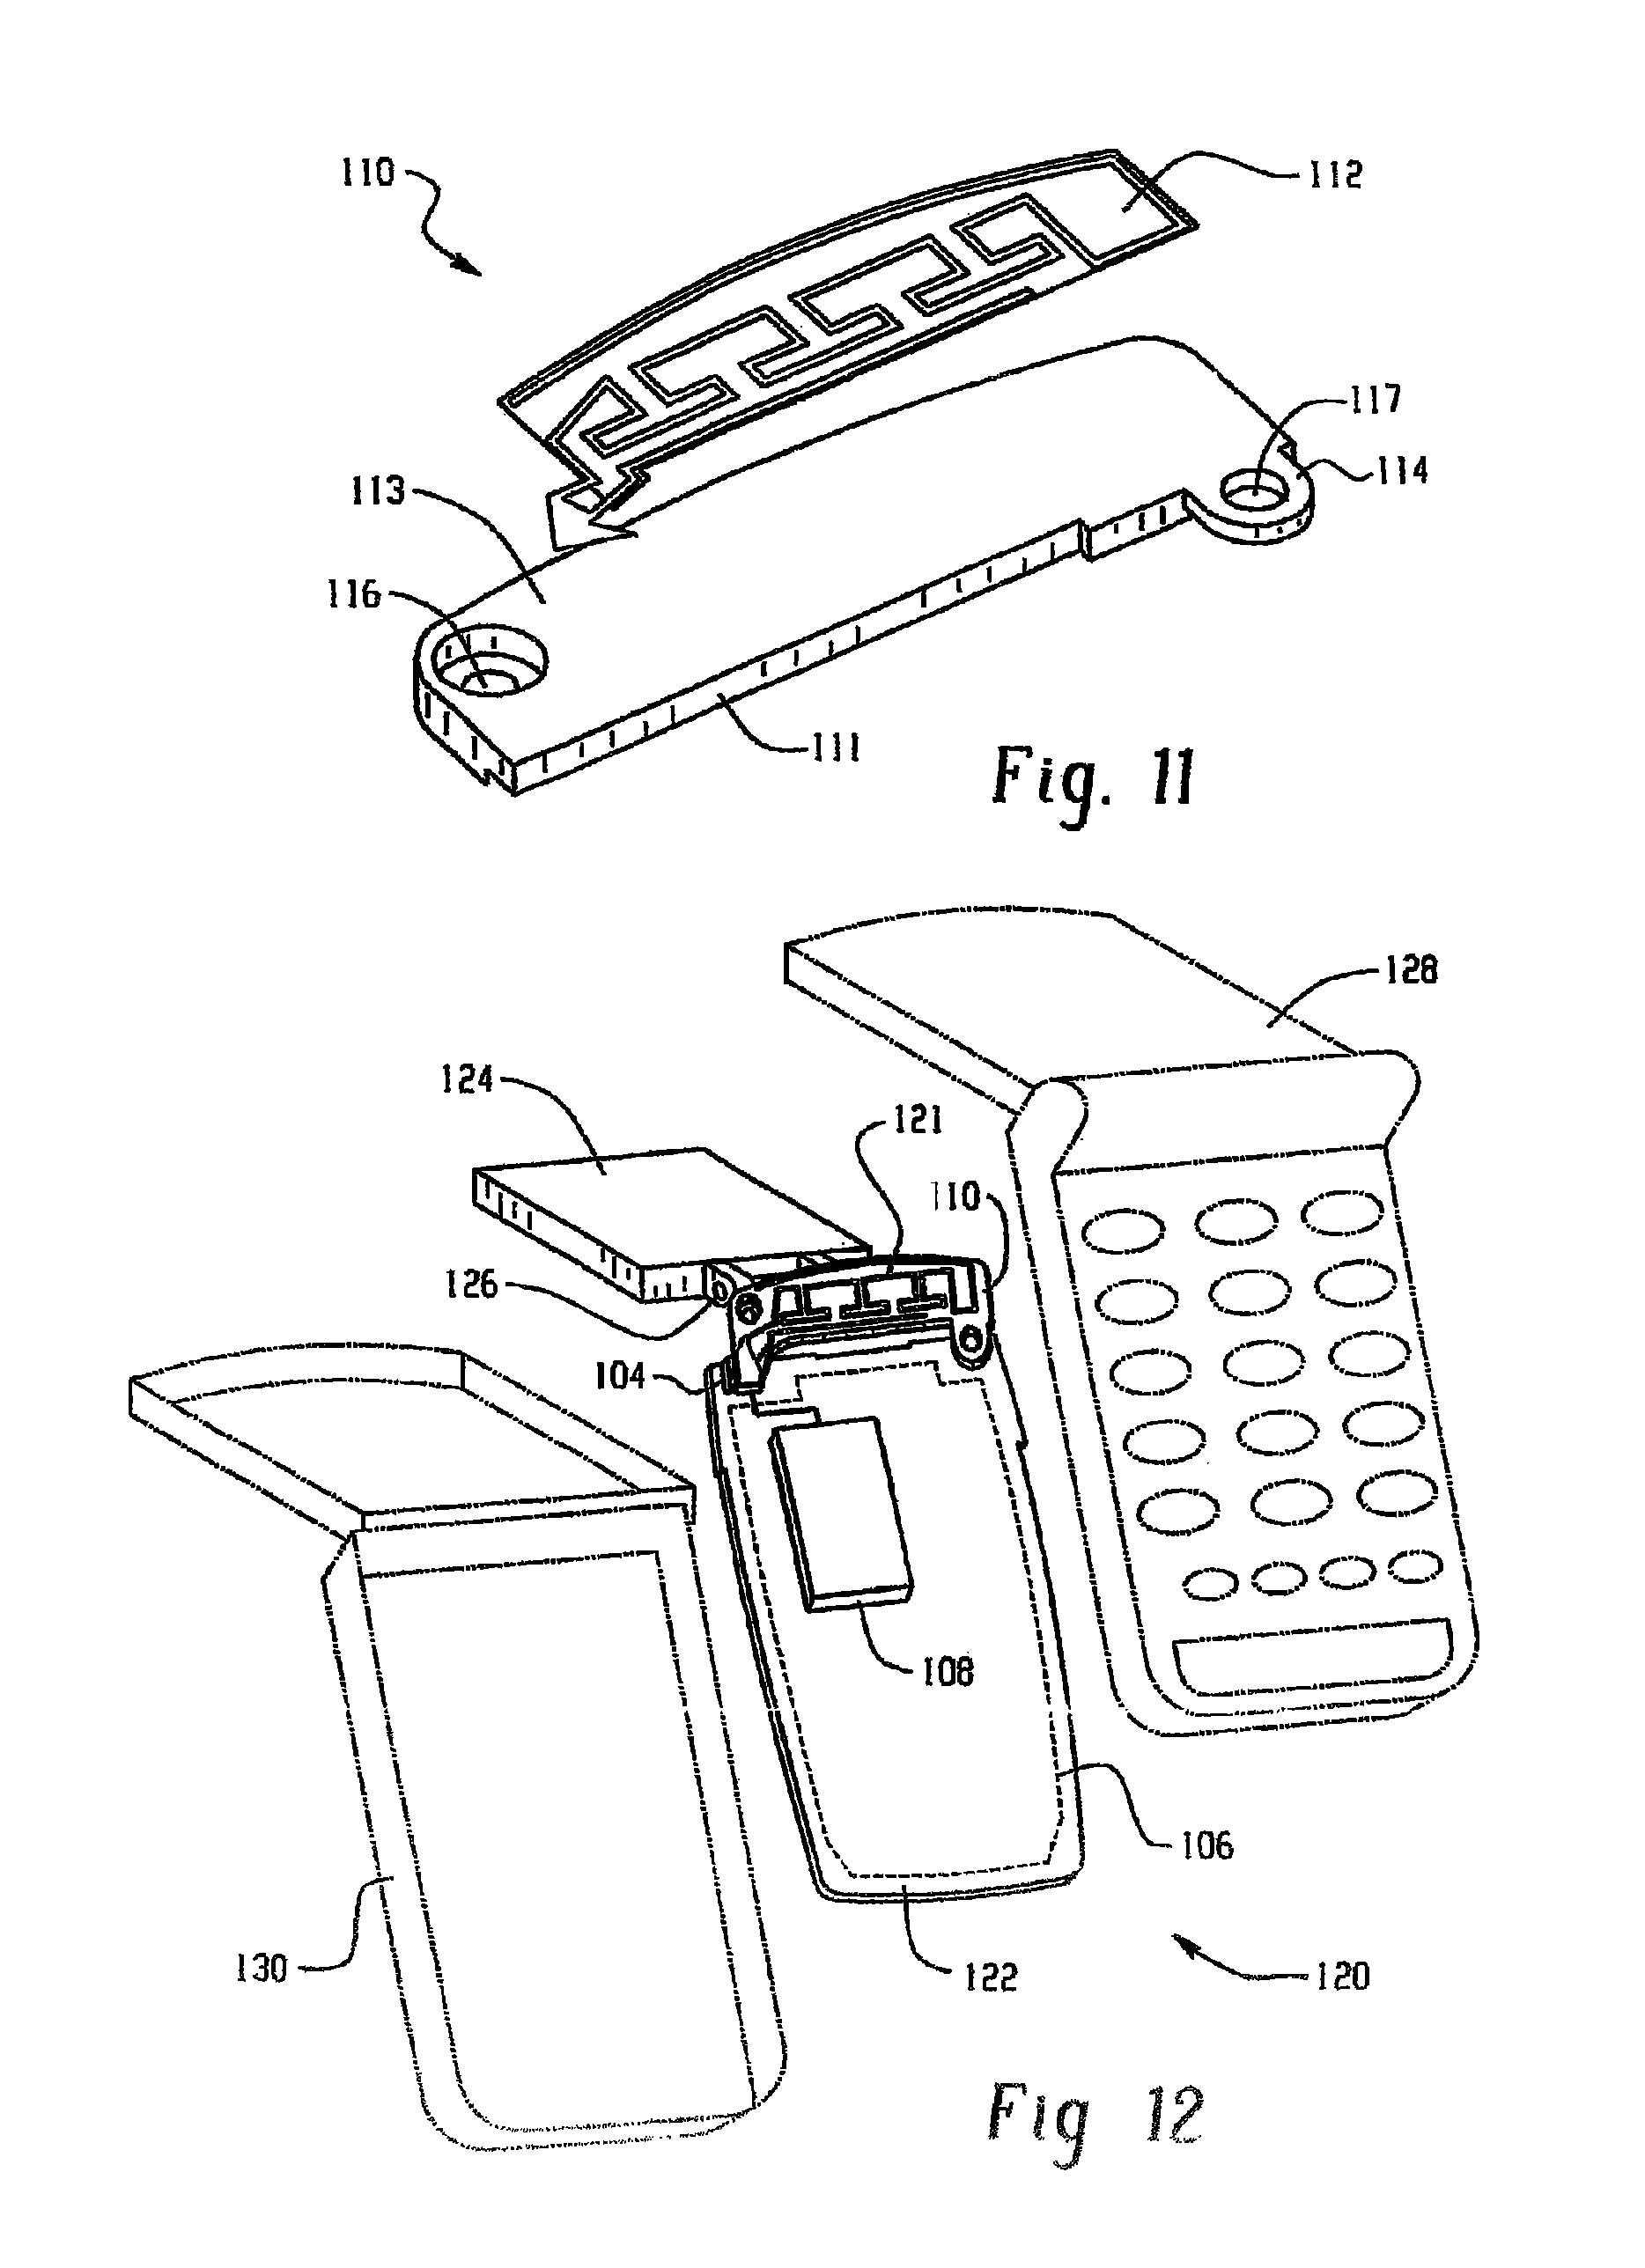 Mobile Device Schematics